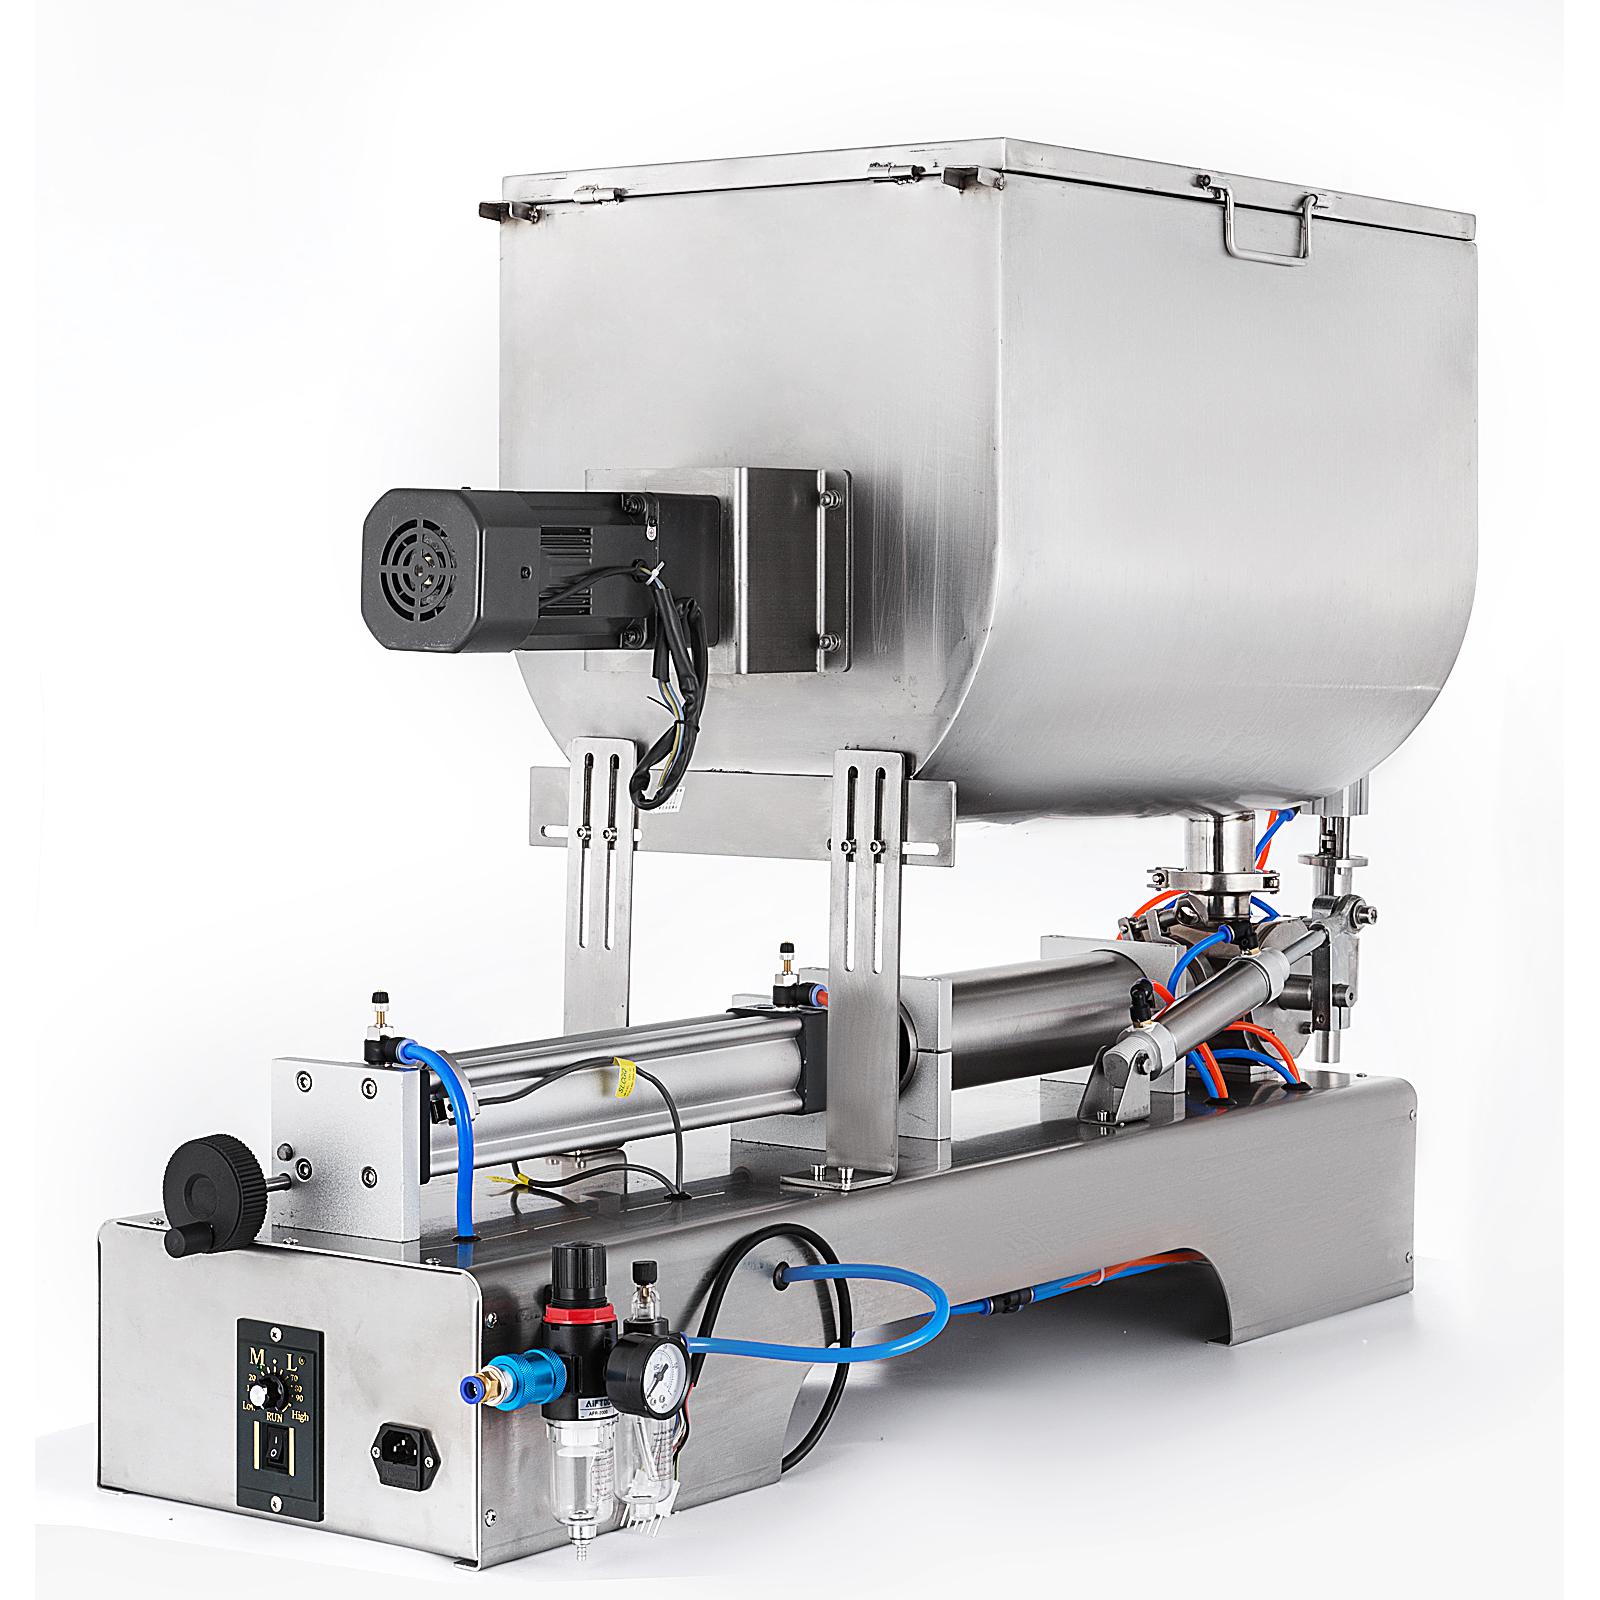 Liquid-Filling-Machine-Filler-Remplissage-2-3500ML-50-500ML-INDUSTRY-SUPPLY miniature 87